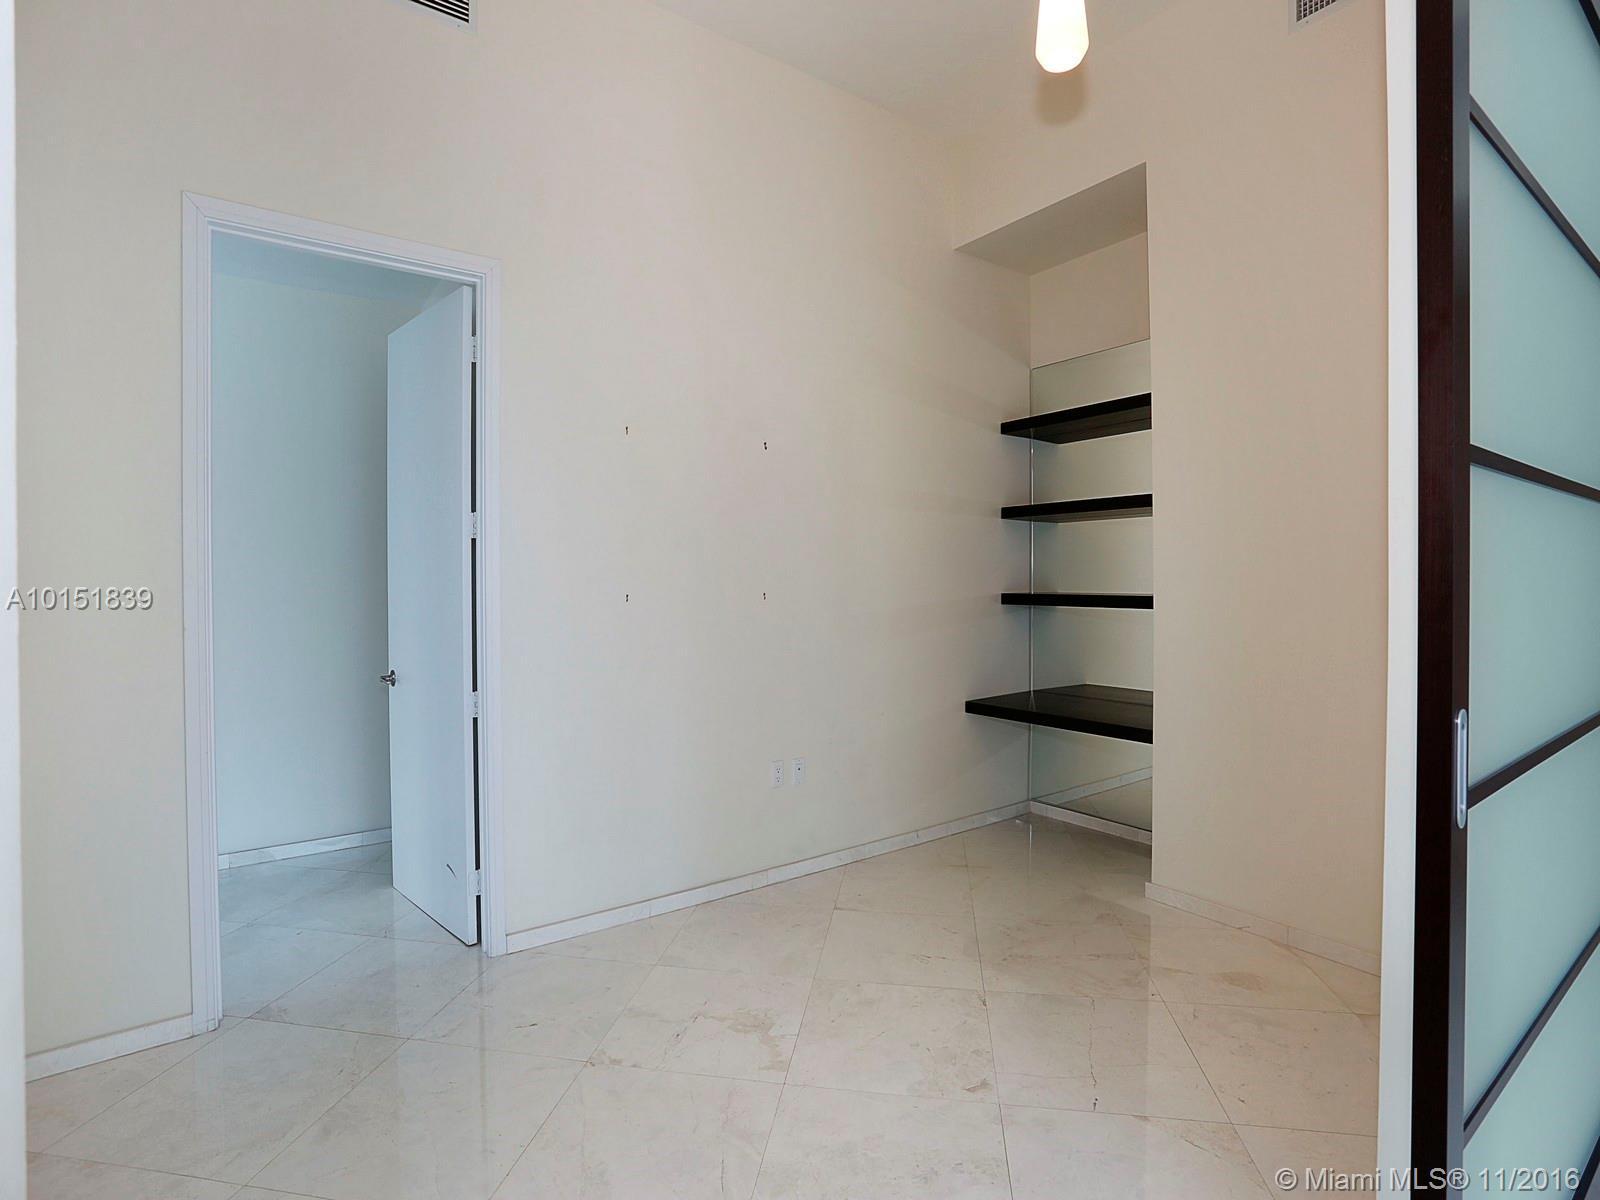 900 Brickell key blvd-501 miami--fl-33131-a10151839-Pic10